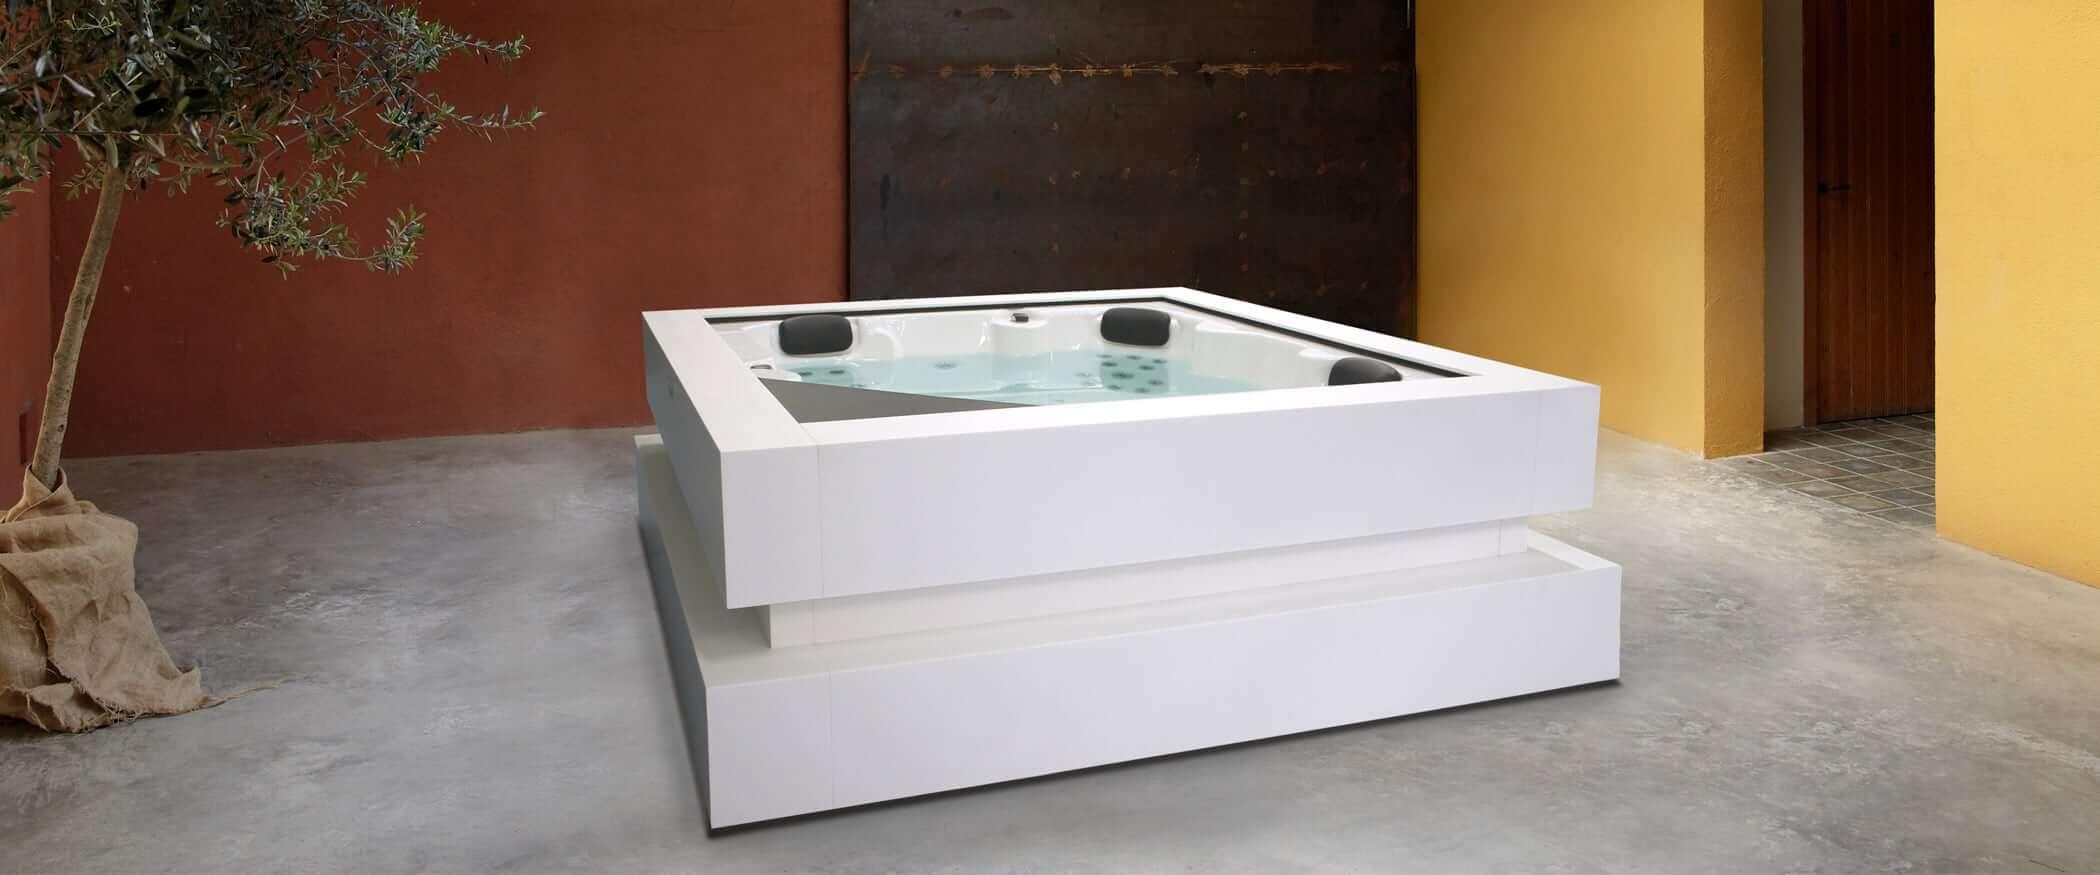 Buy the exclusive hot tub Cube Ergo - Aquavia Spa UK